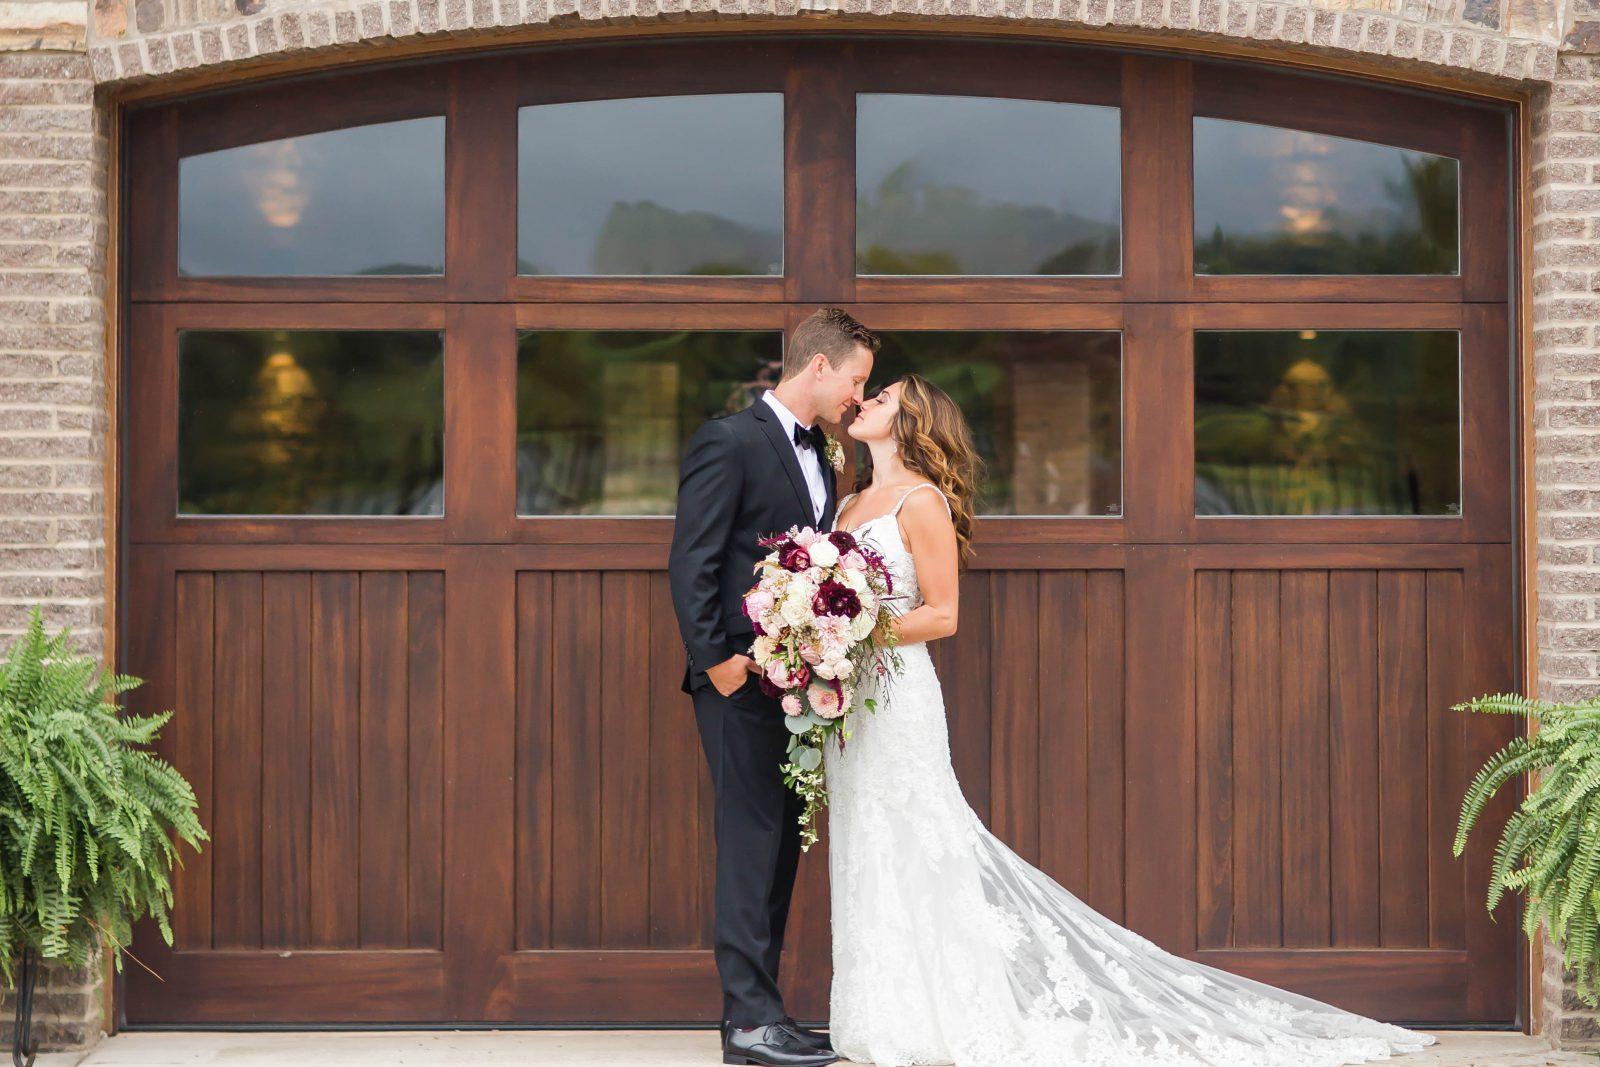 sunny-hill-wedding-venue-loren-jackson-photography-62